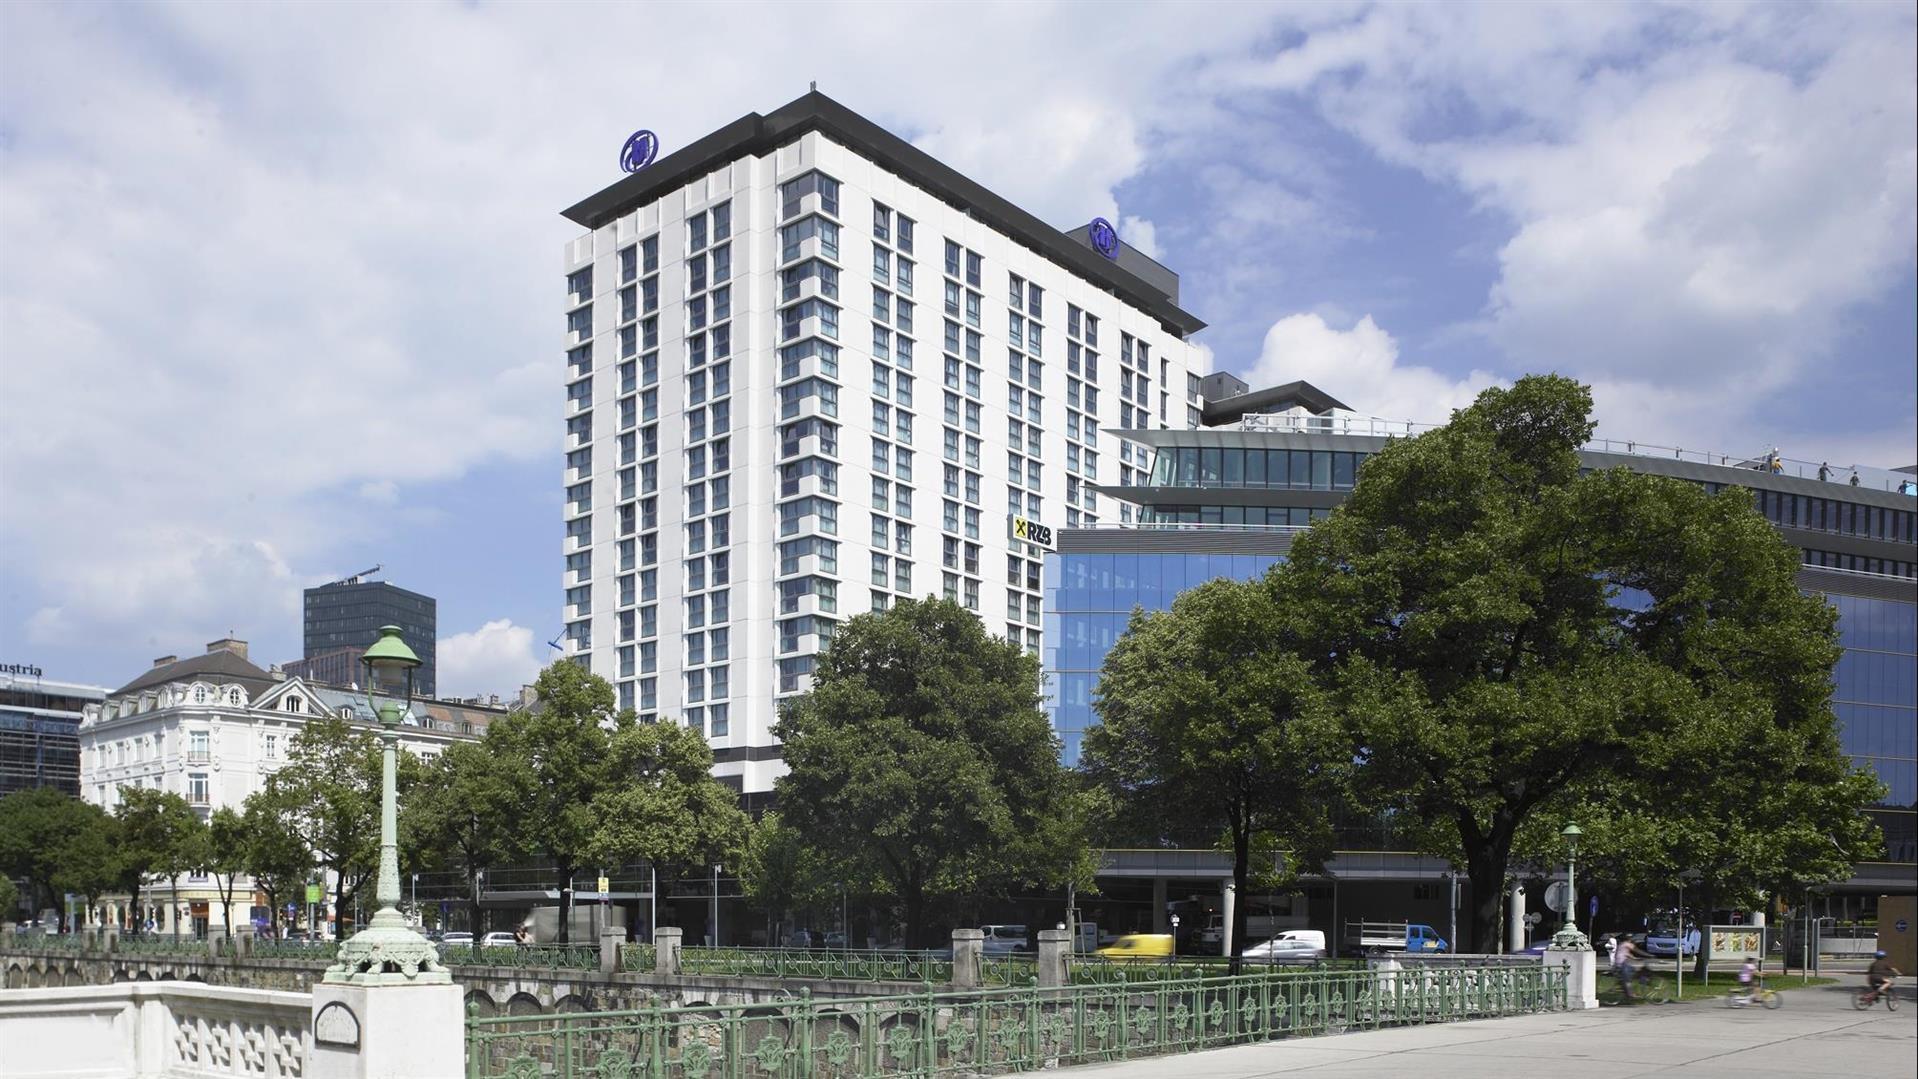 Meetings And Events At Hilton Vienna Vienna At